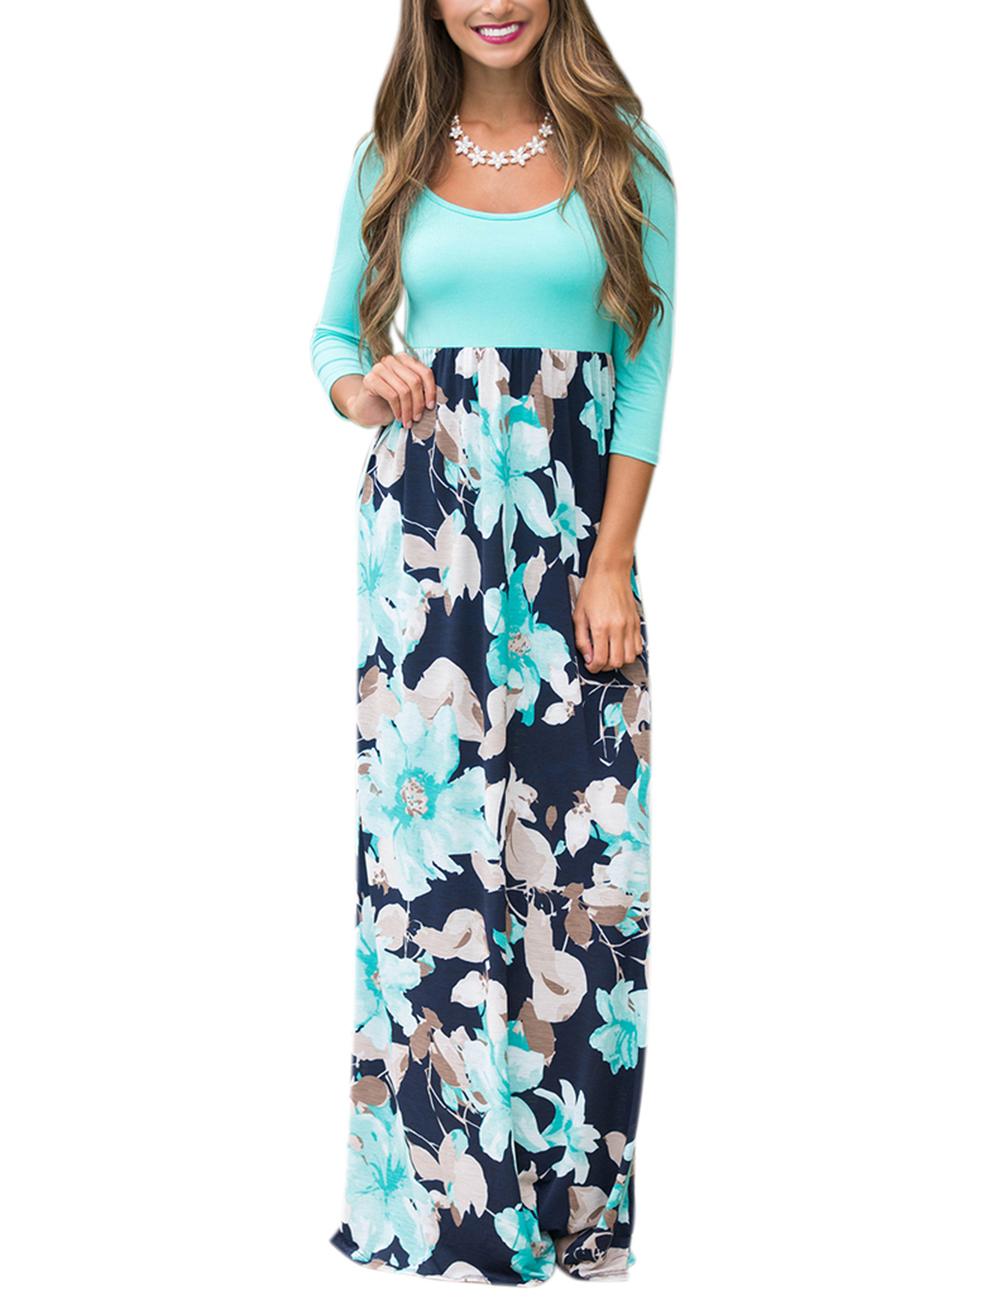 GloryStar Women 3/4 Sleeve Scoop Neck Spliced Floral Boho Maxi Holiday Dress L